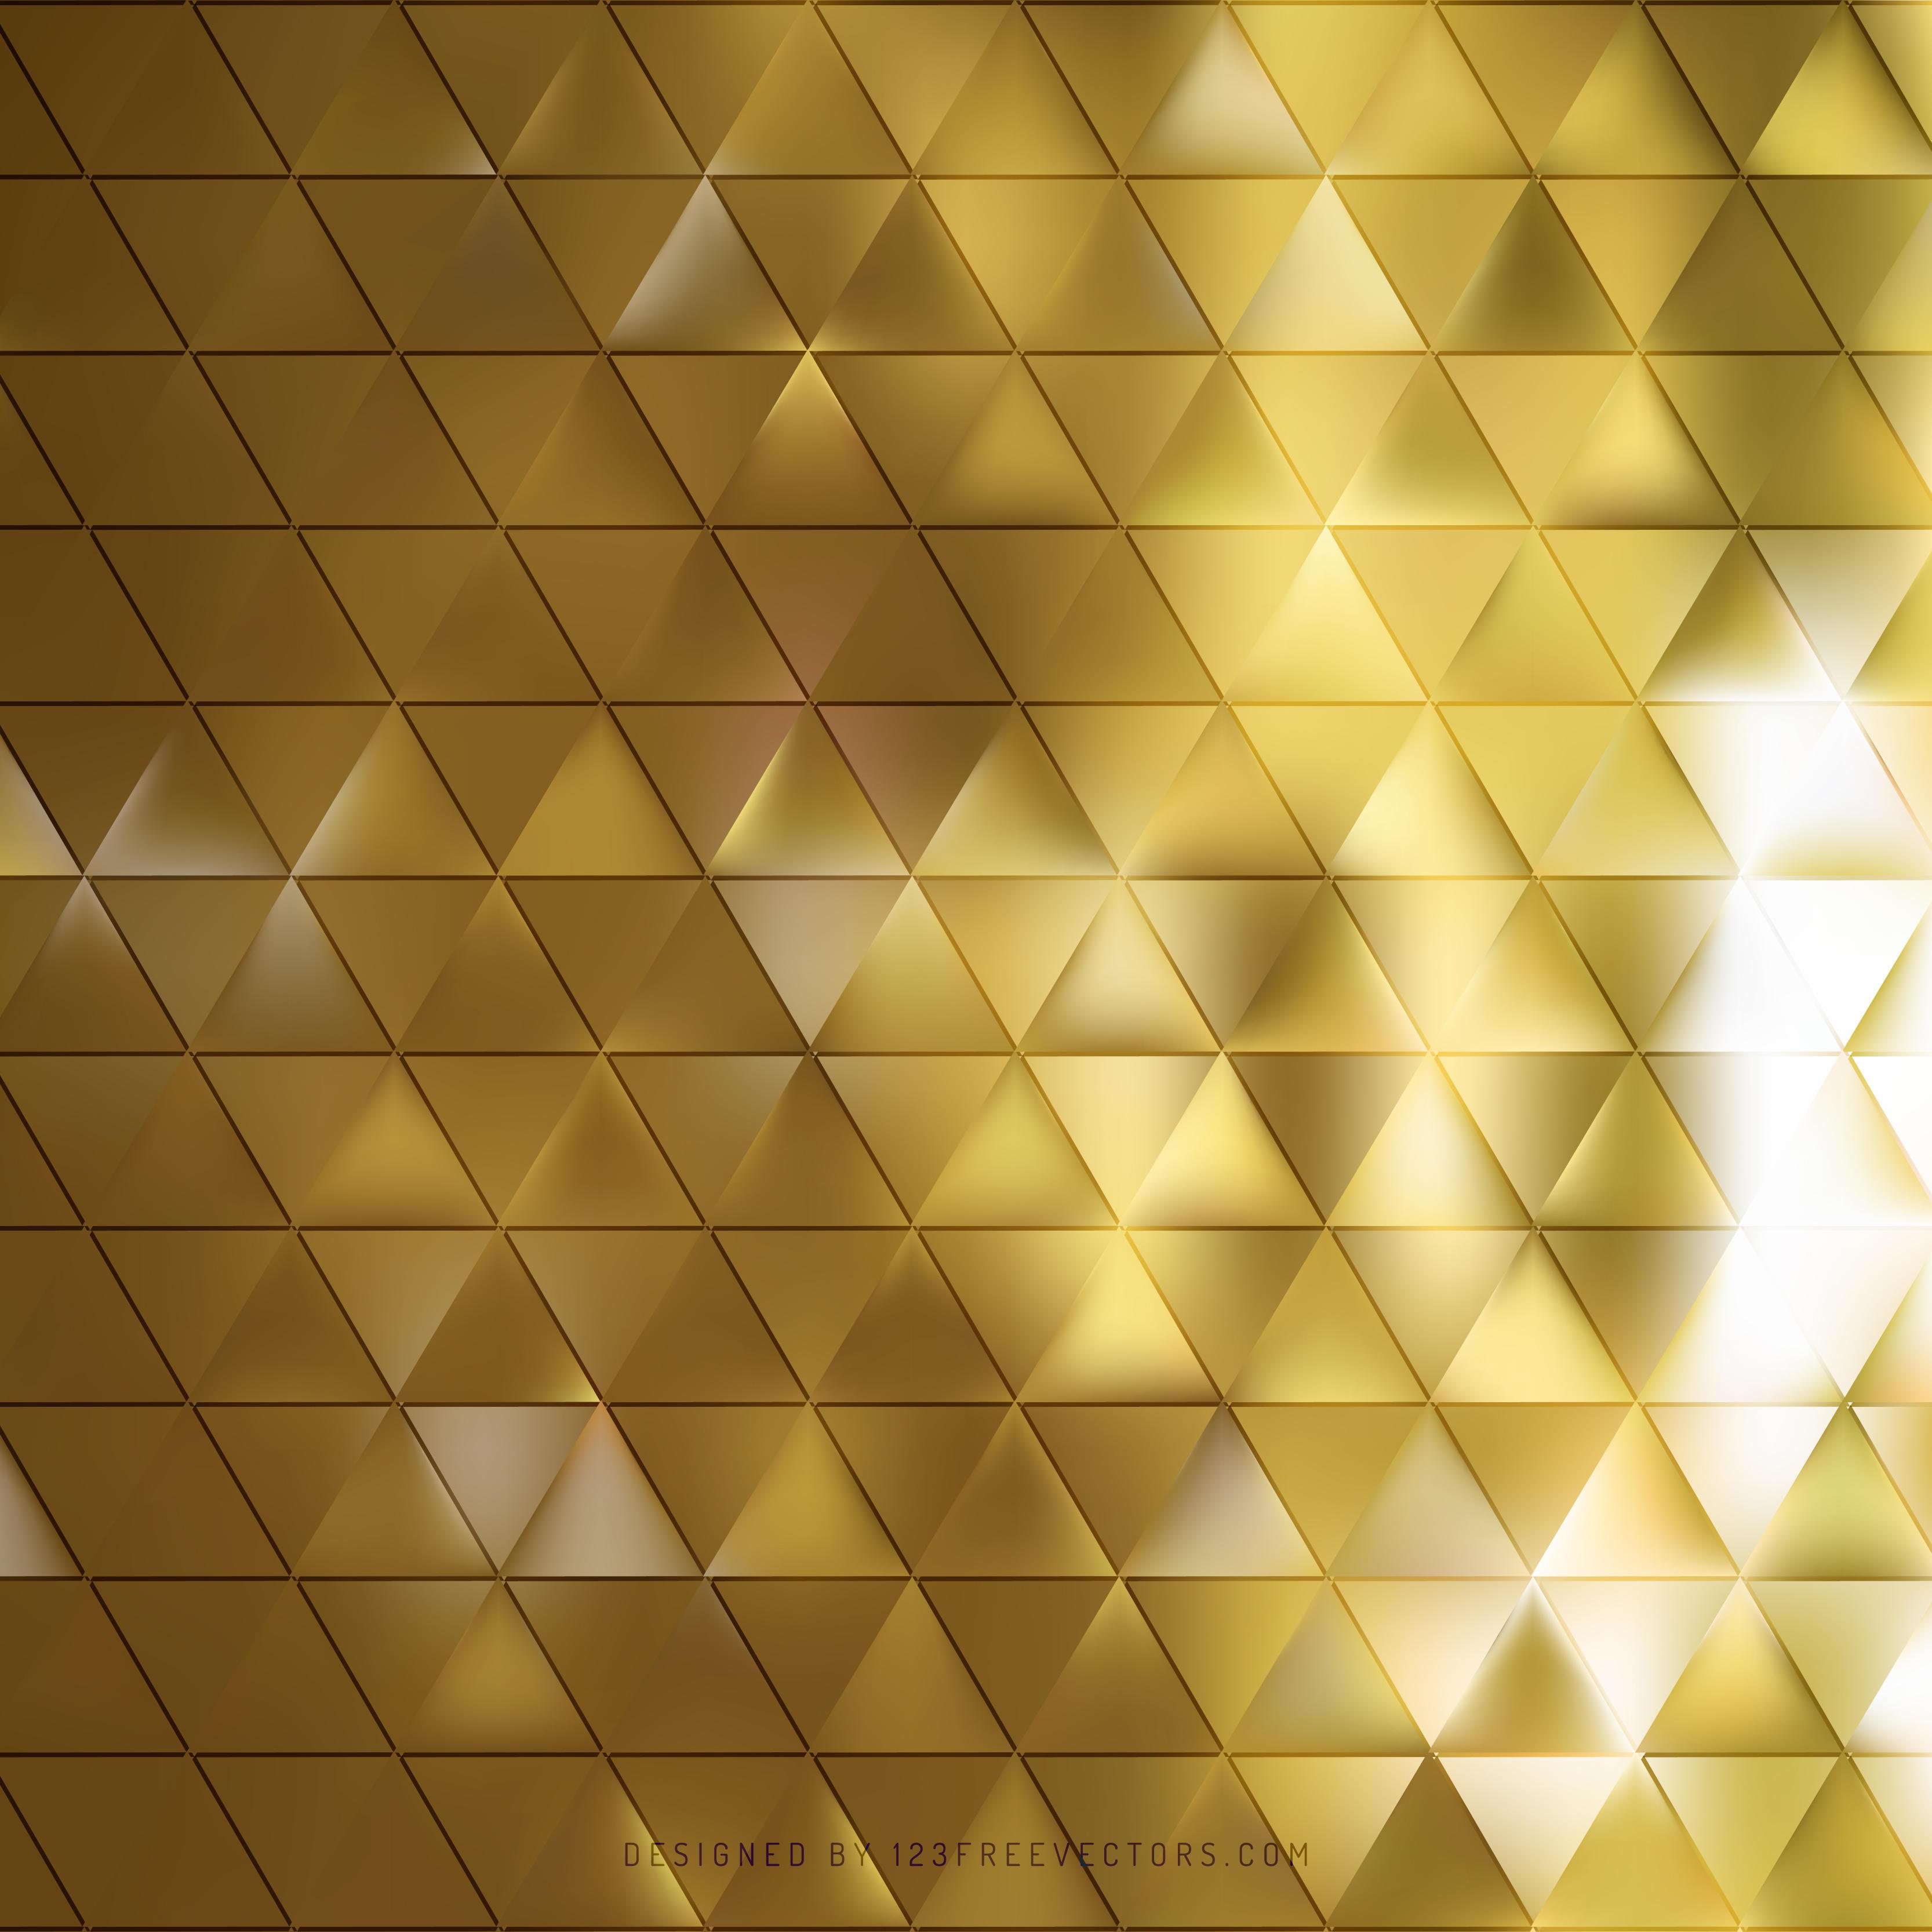 370 Gold Background Vectors